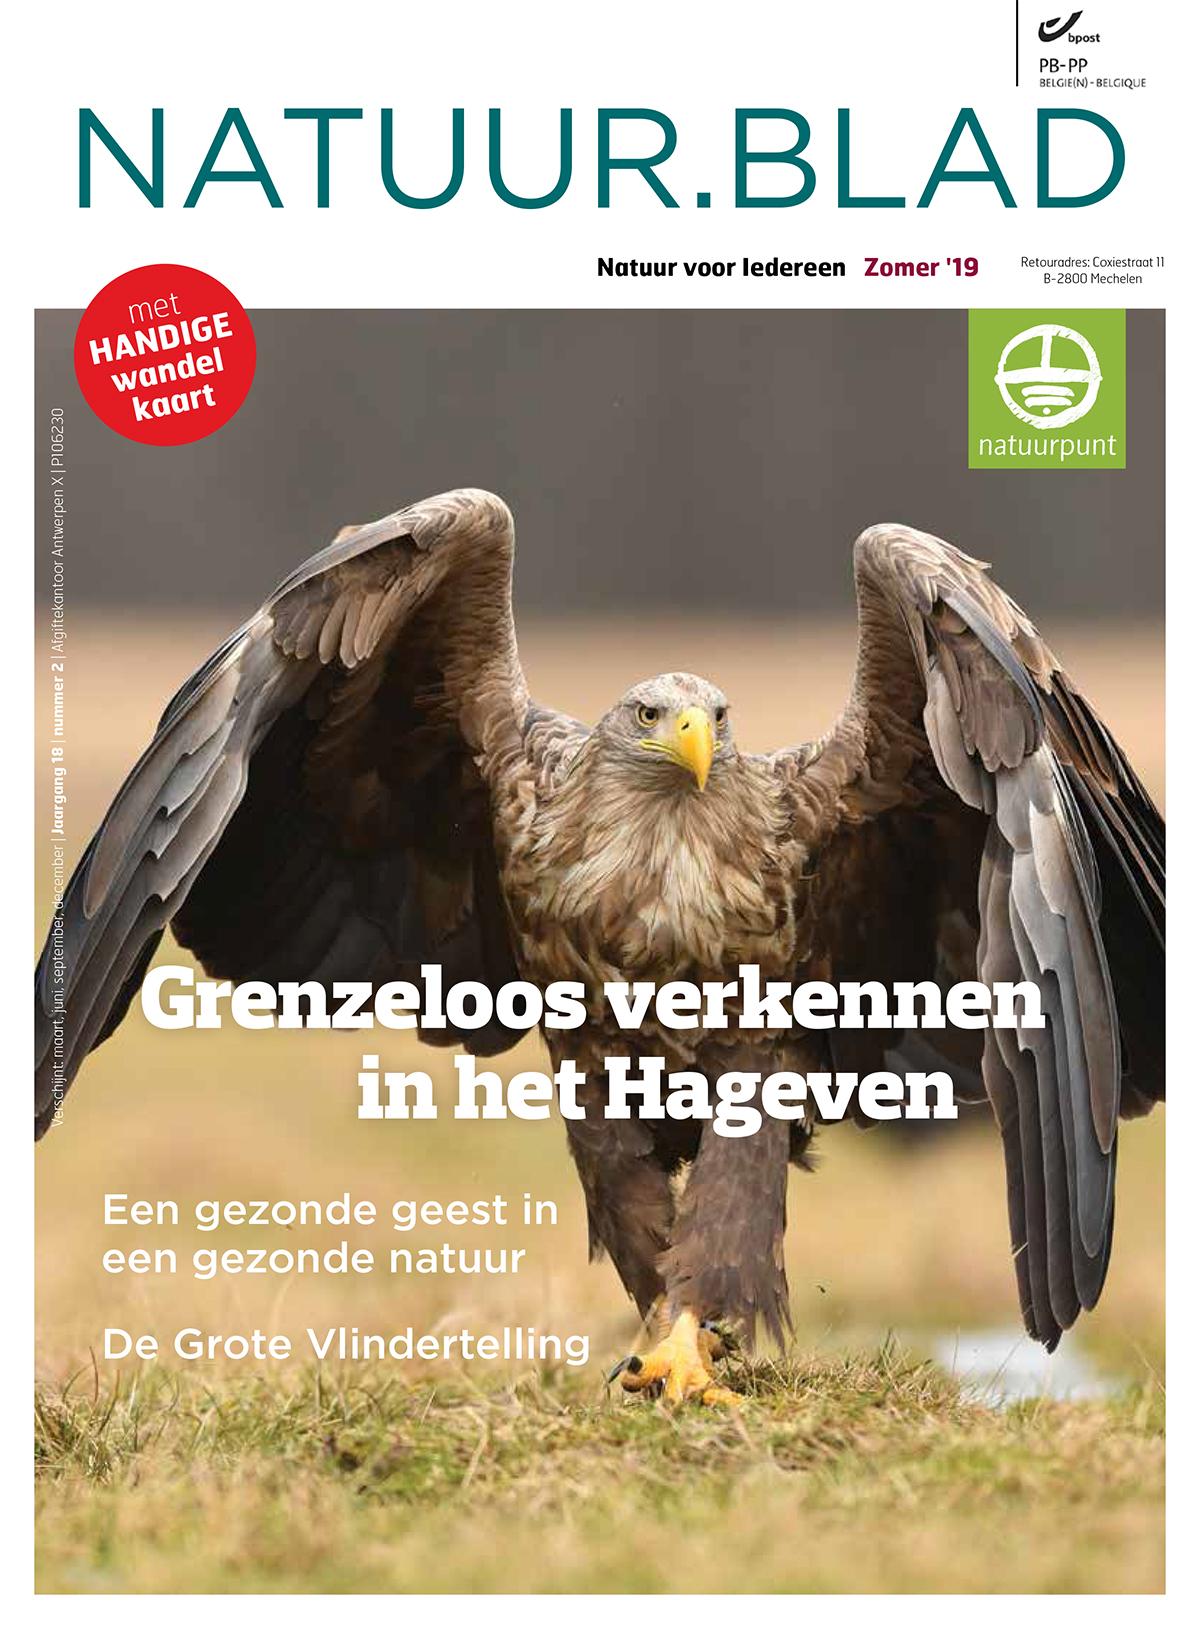 Natuur.blad Zomer 2019